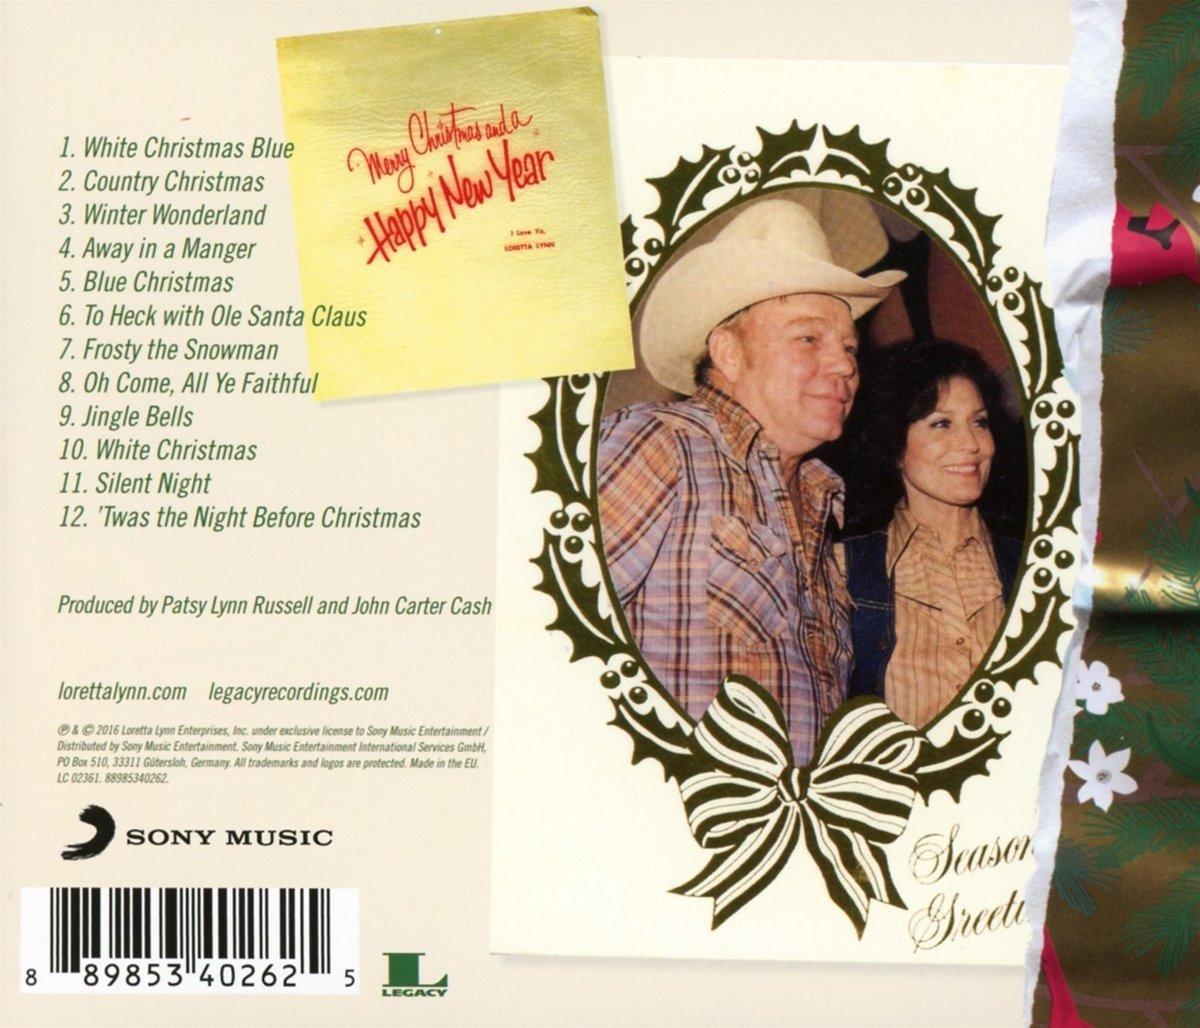 loretta lynn white christmas blue amazoncom music - What Year Did White Christmas Come Out